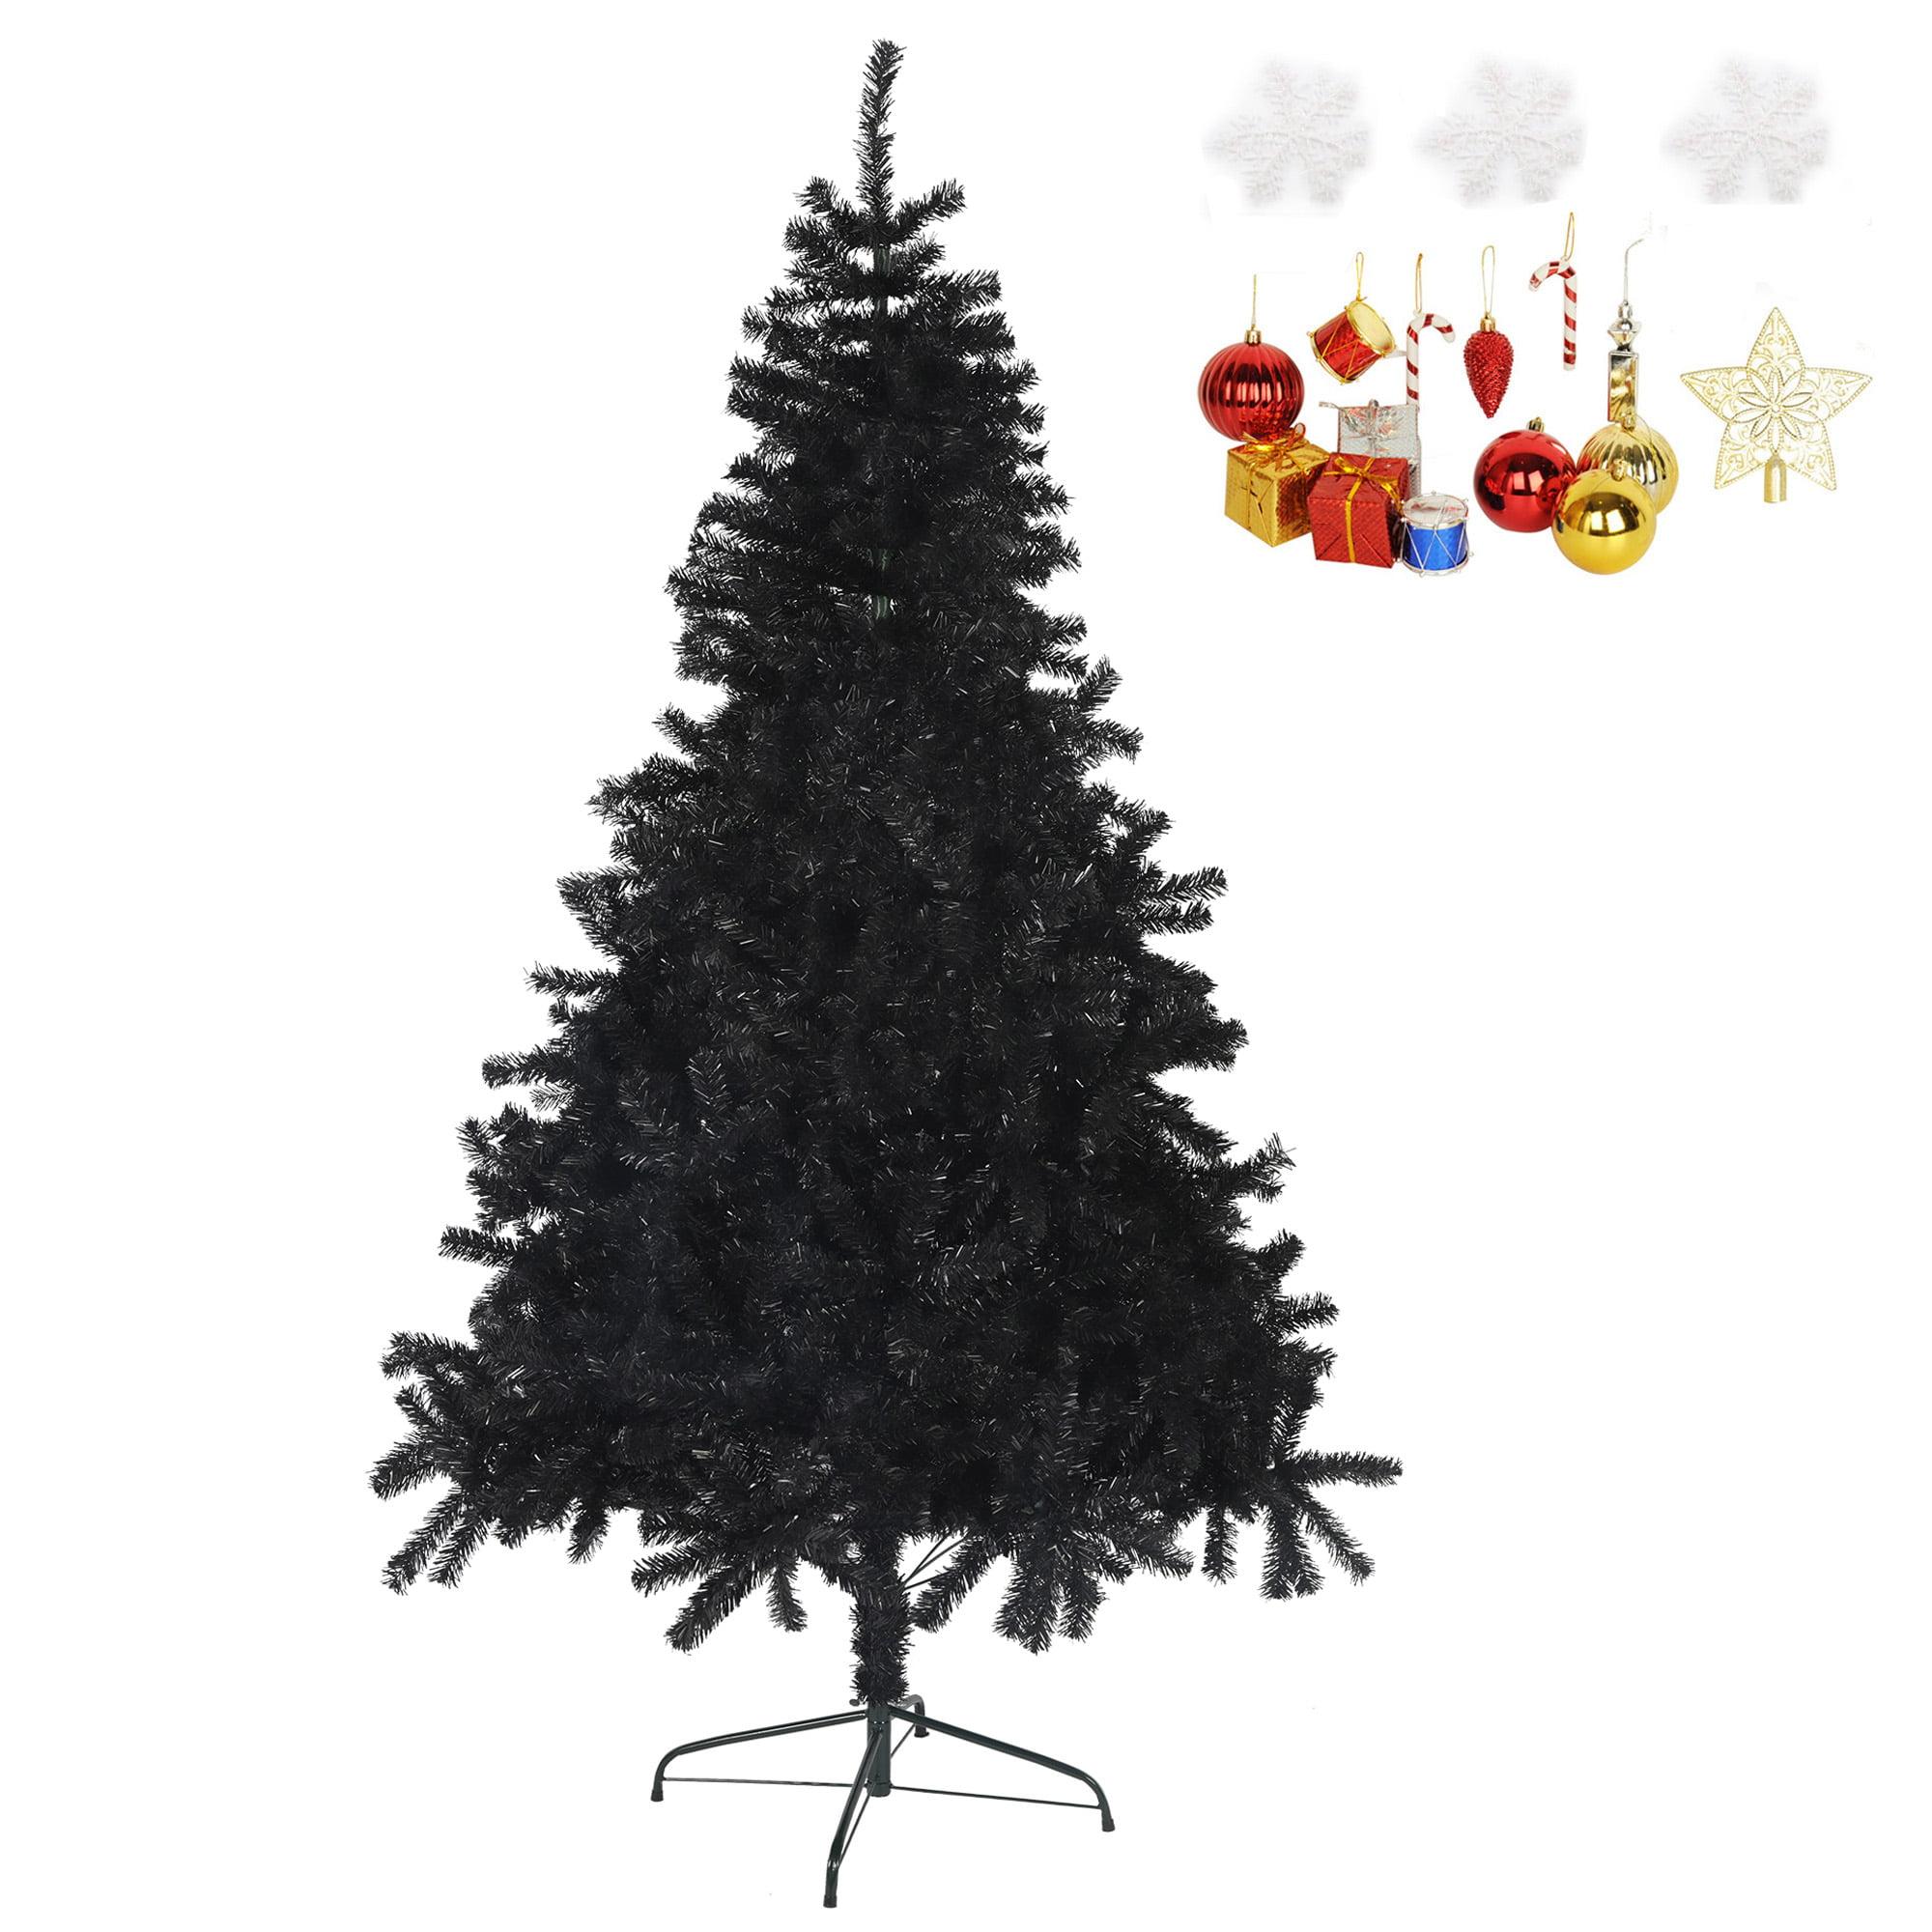 Karmas Product Black Christmas Tree 7 Feet Halloween Tree Artificial Pine Tree Holiday Decoration With Xmas Tree Ornaments W 1000 Branch Tips Walmart Com Walmart Com